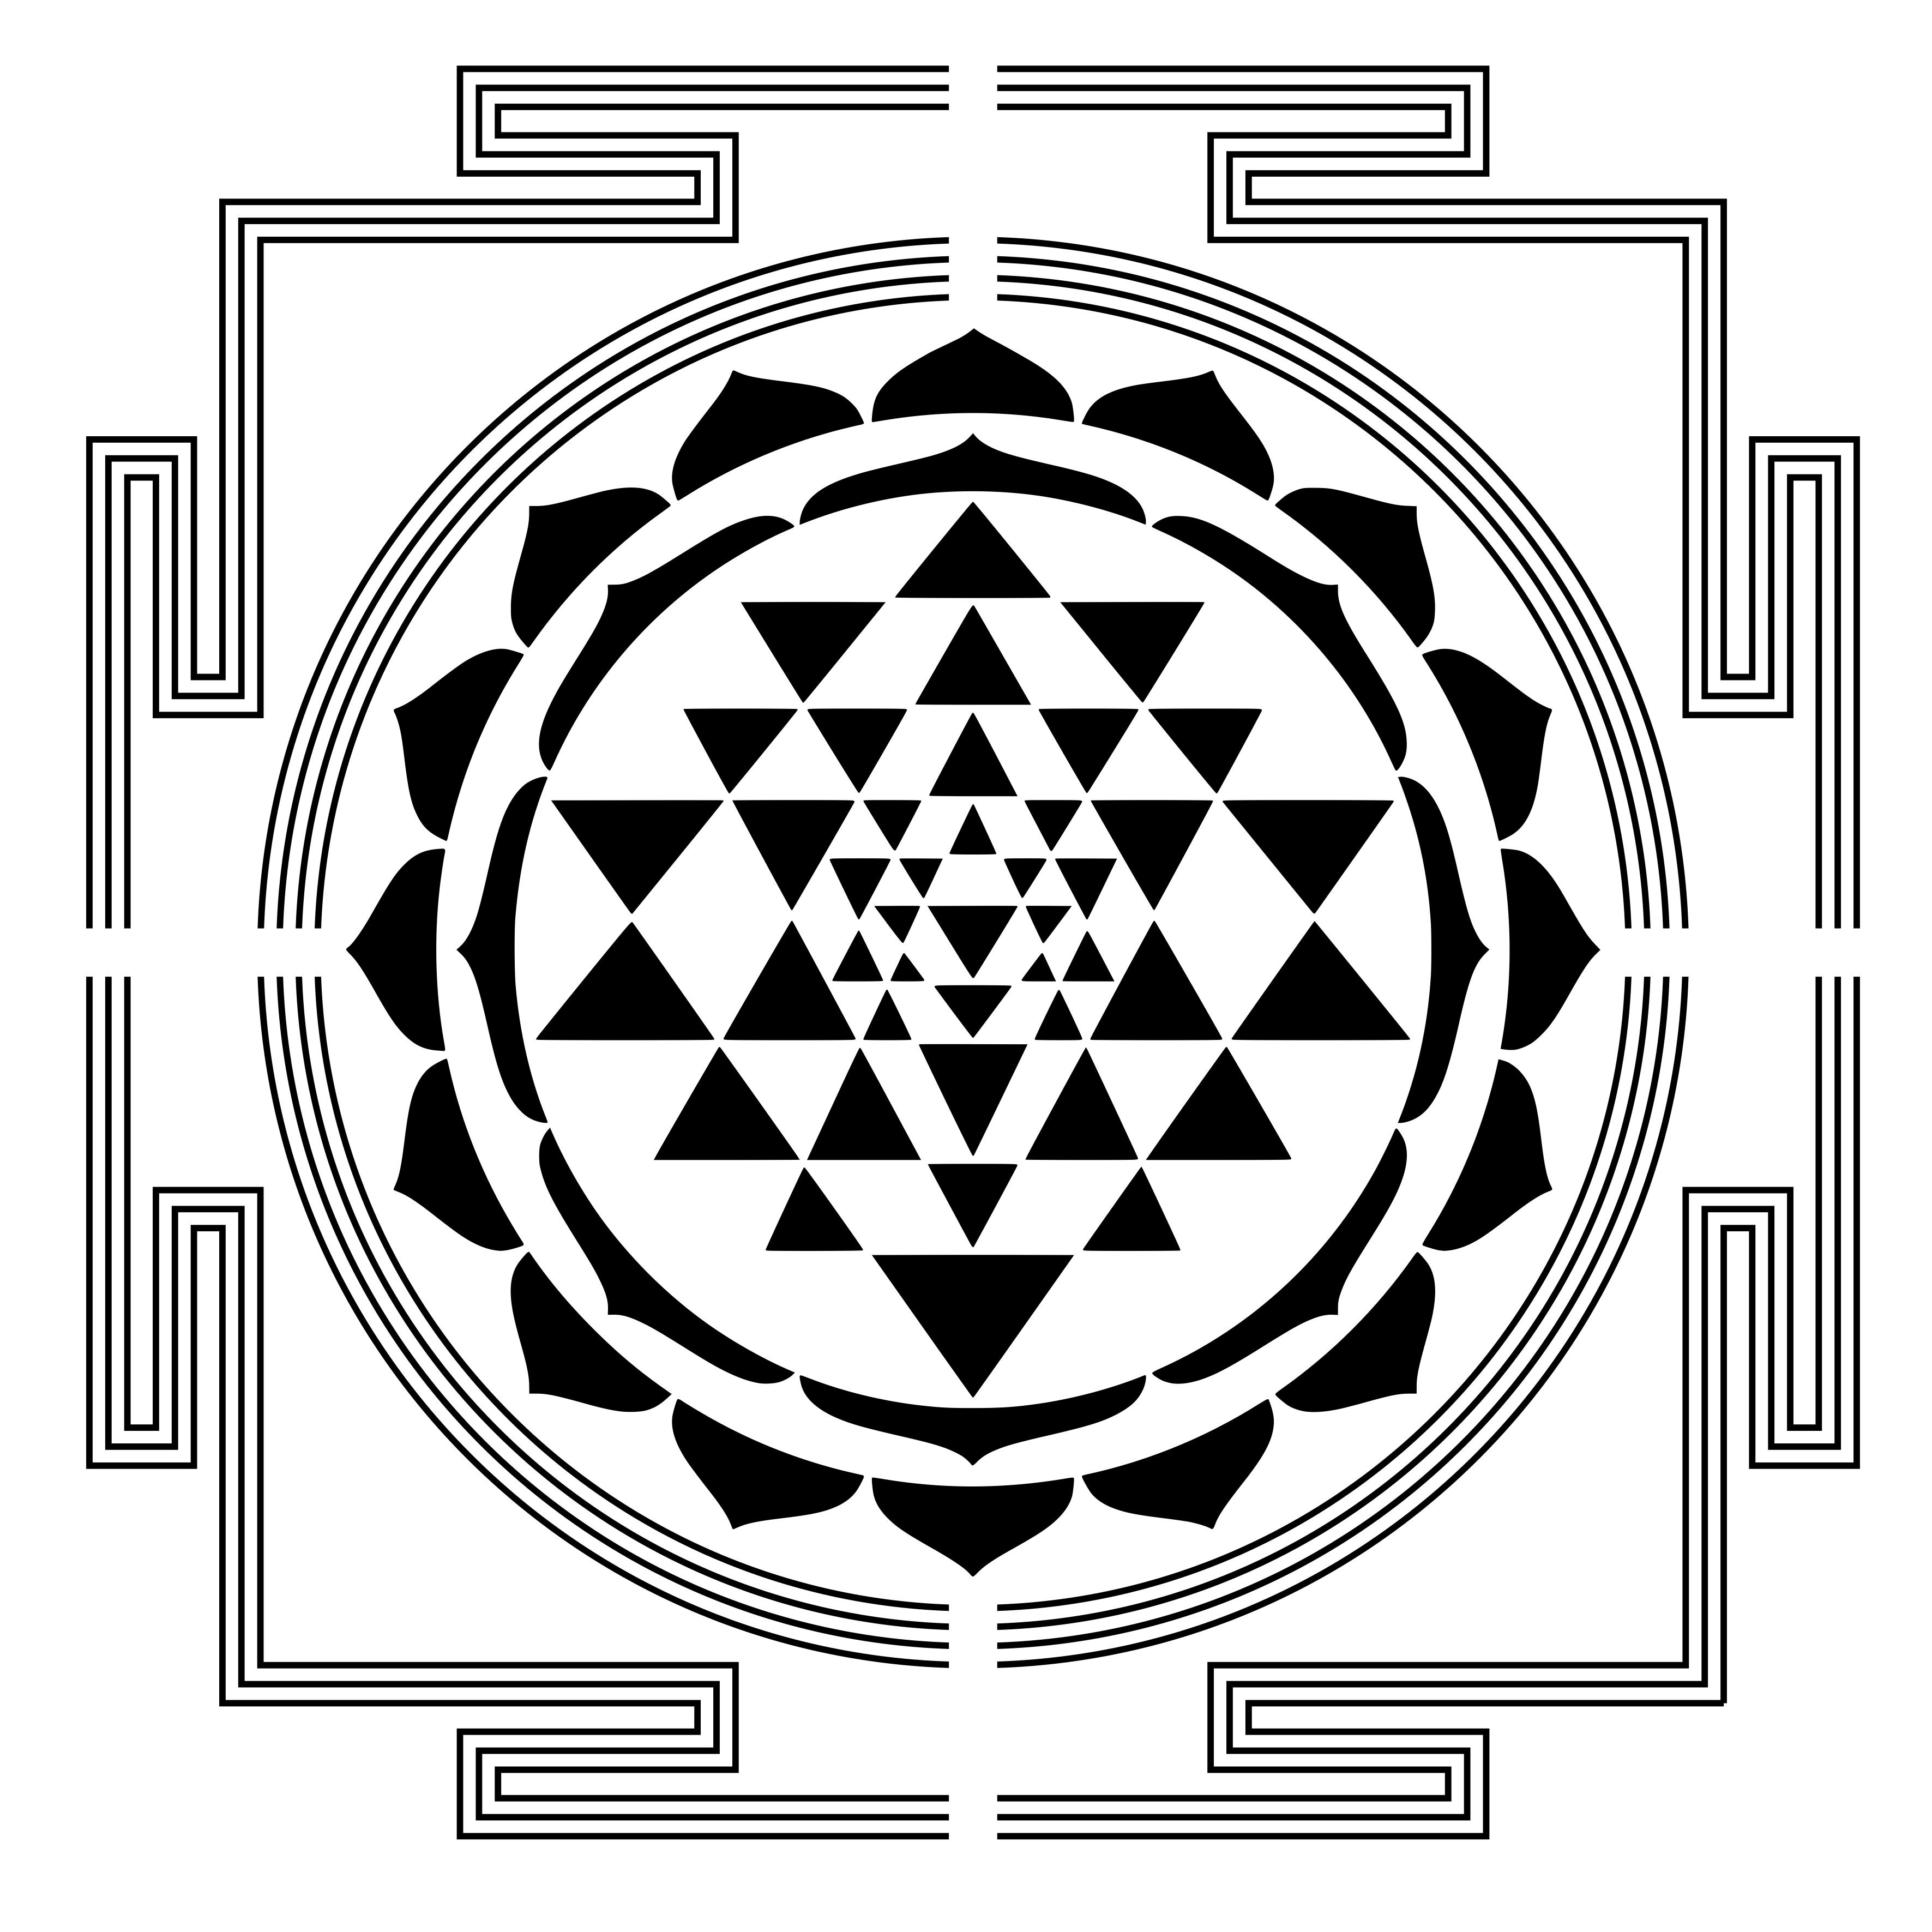 Sri Yantra Stencil by TrovadorZ on DeviantArt